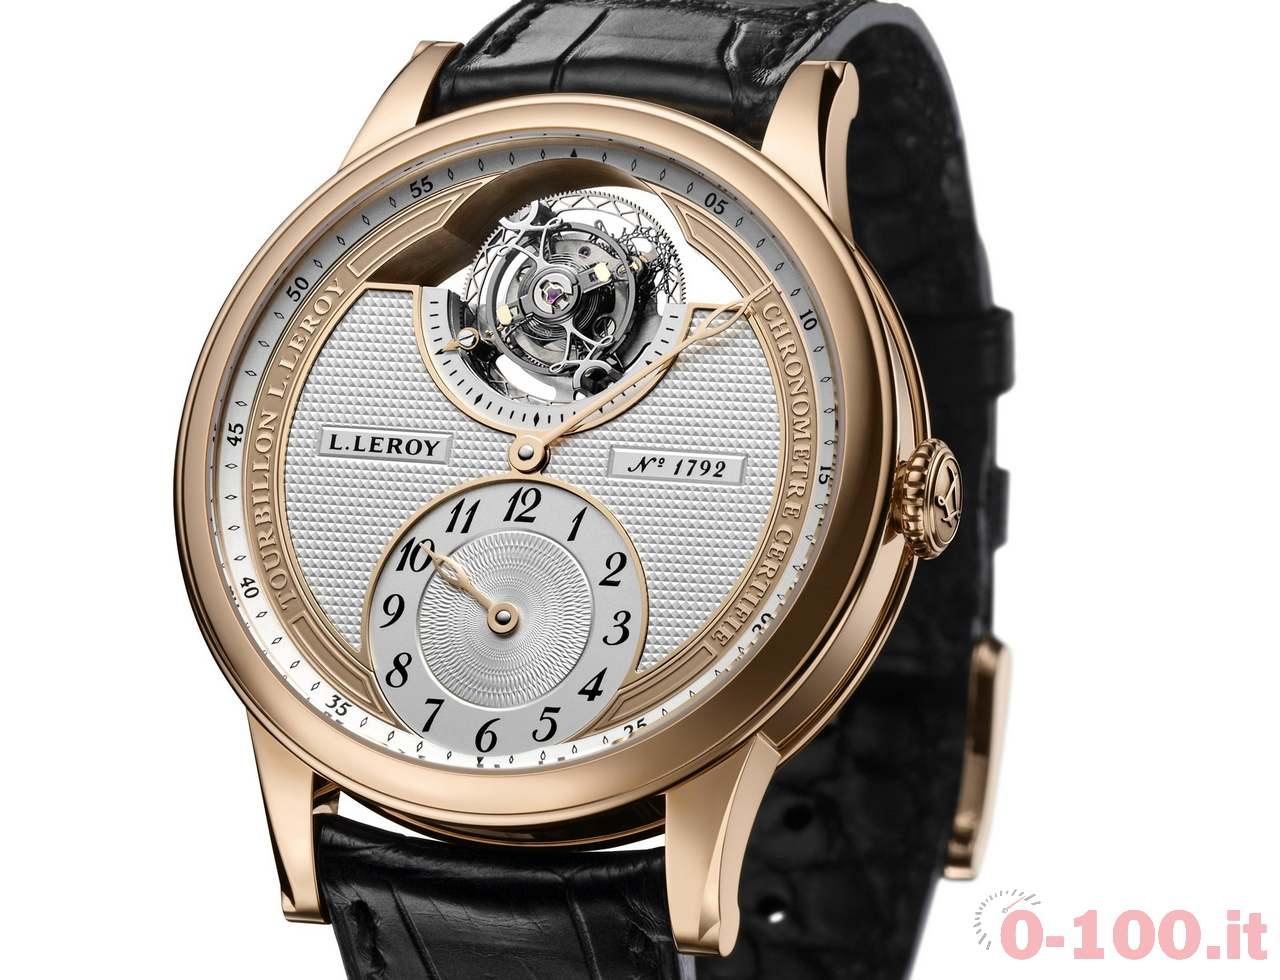 l-leroy-tourbillon-regulateur-osmior-oro-rosa-prezzo-price_0-1002